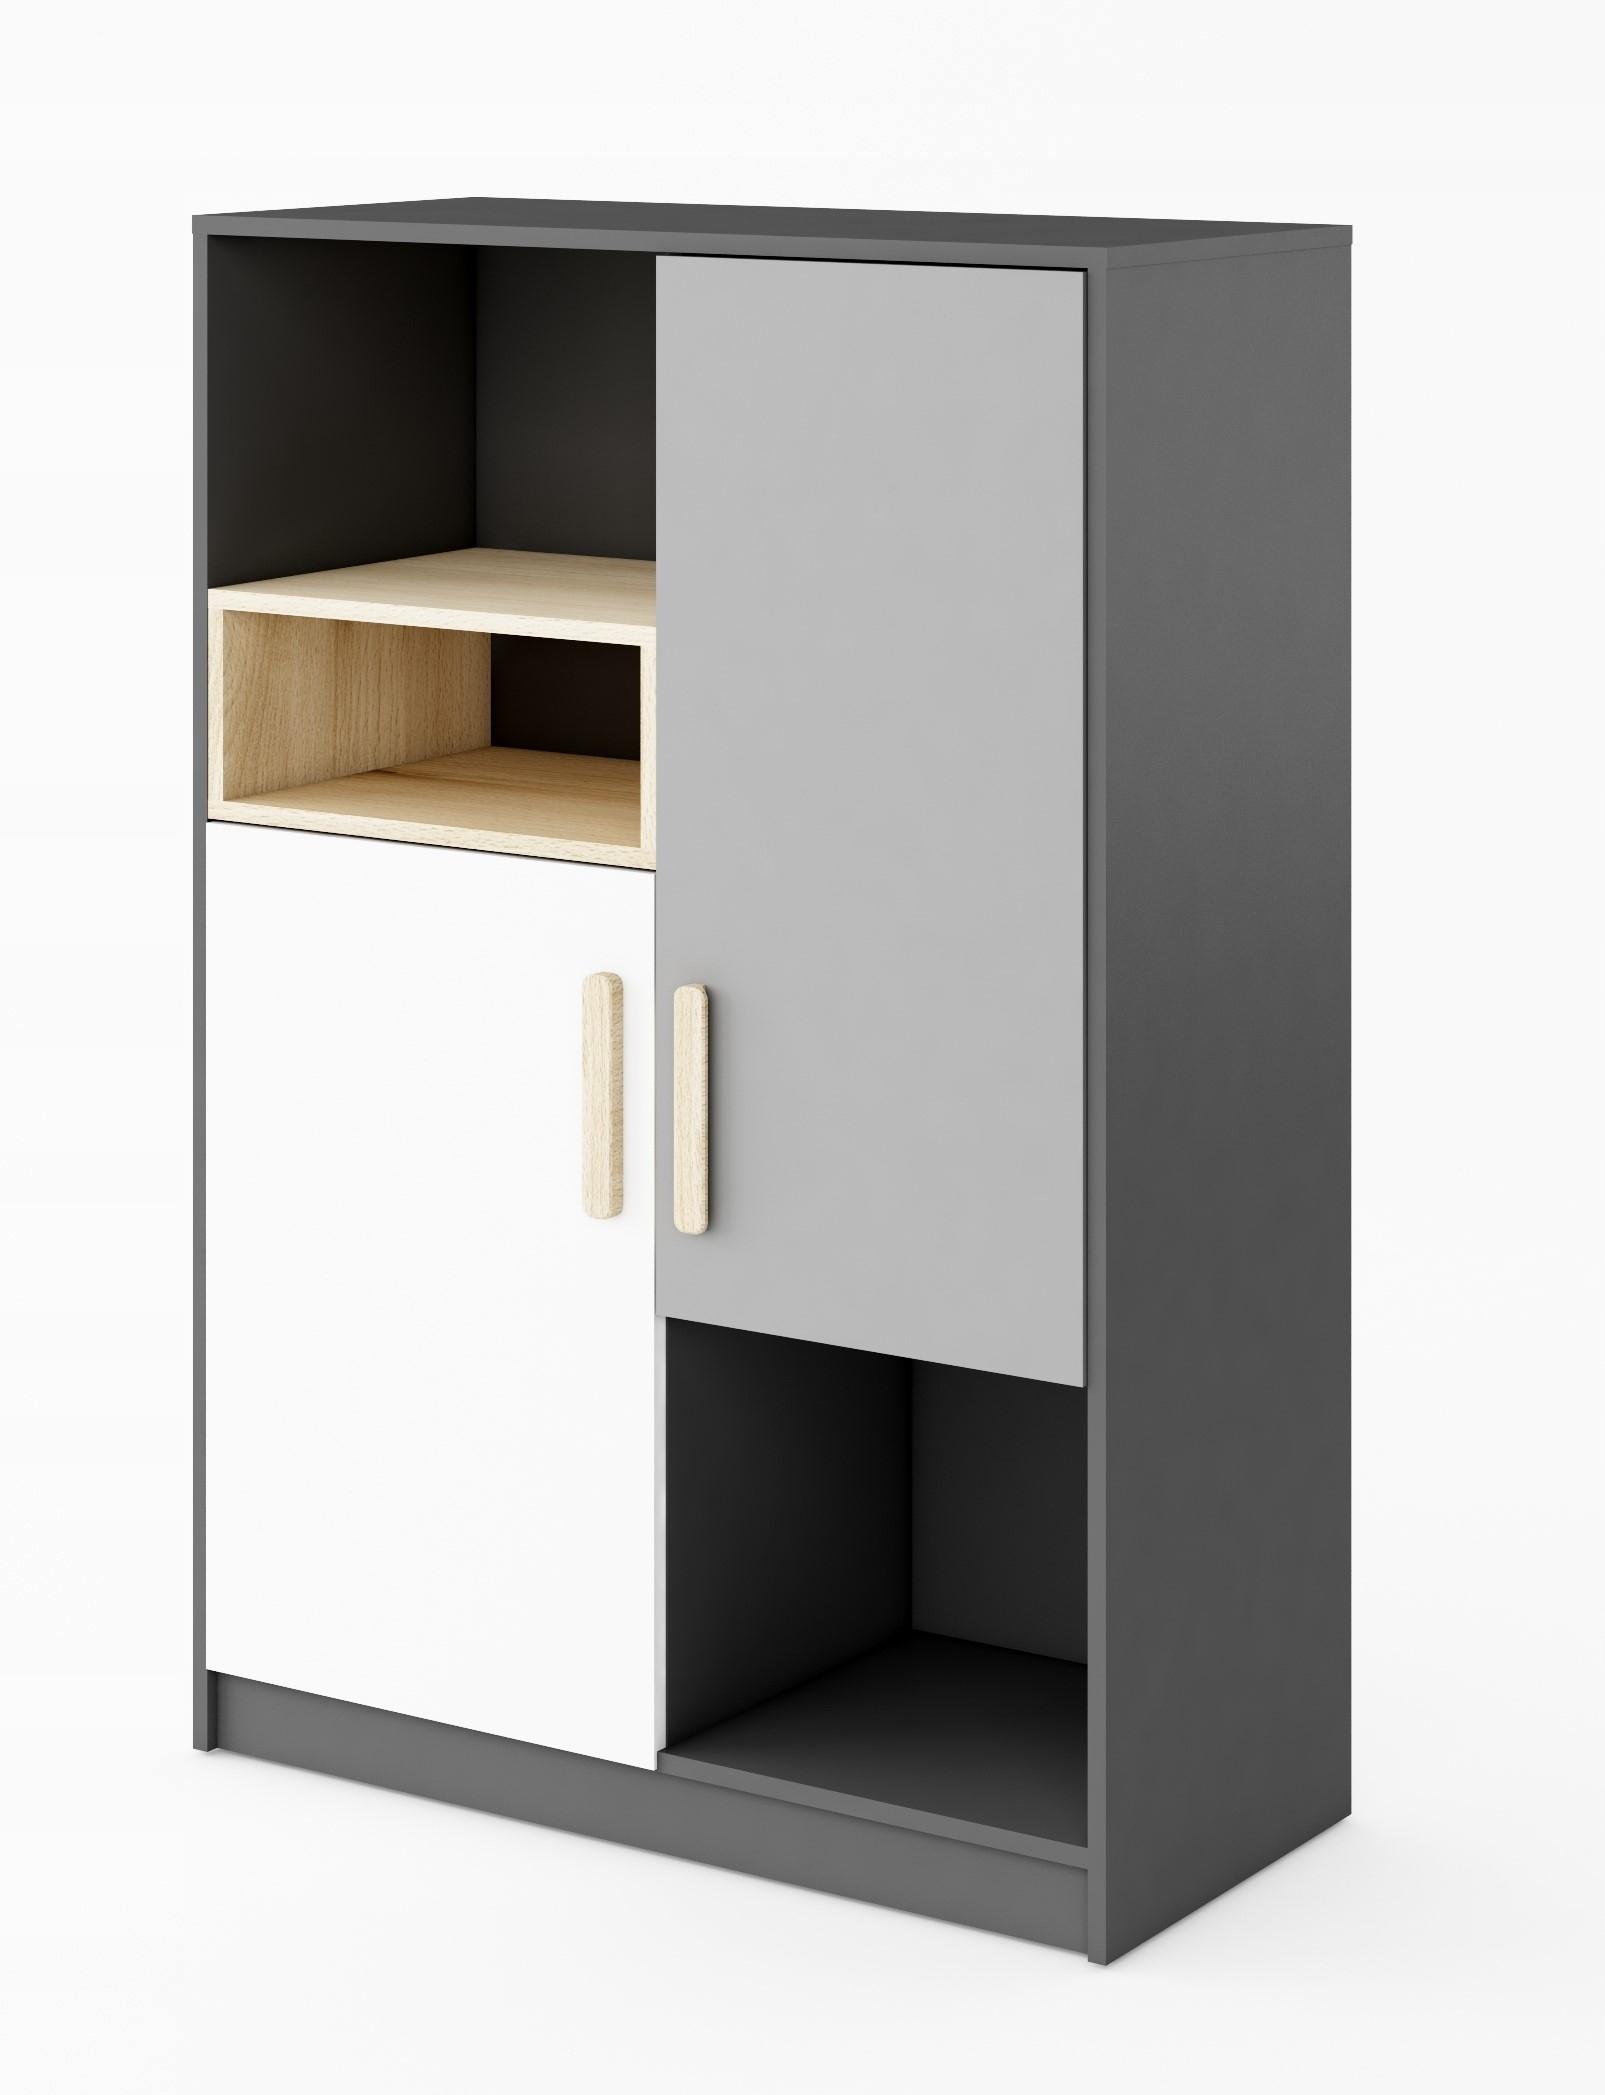 шкаф комод книжный шкаф полки CHILDREN'S ROOM SYSTEM